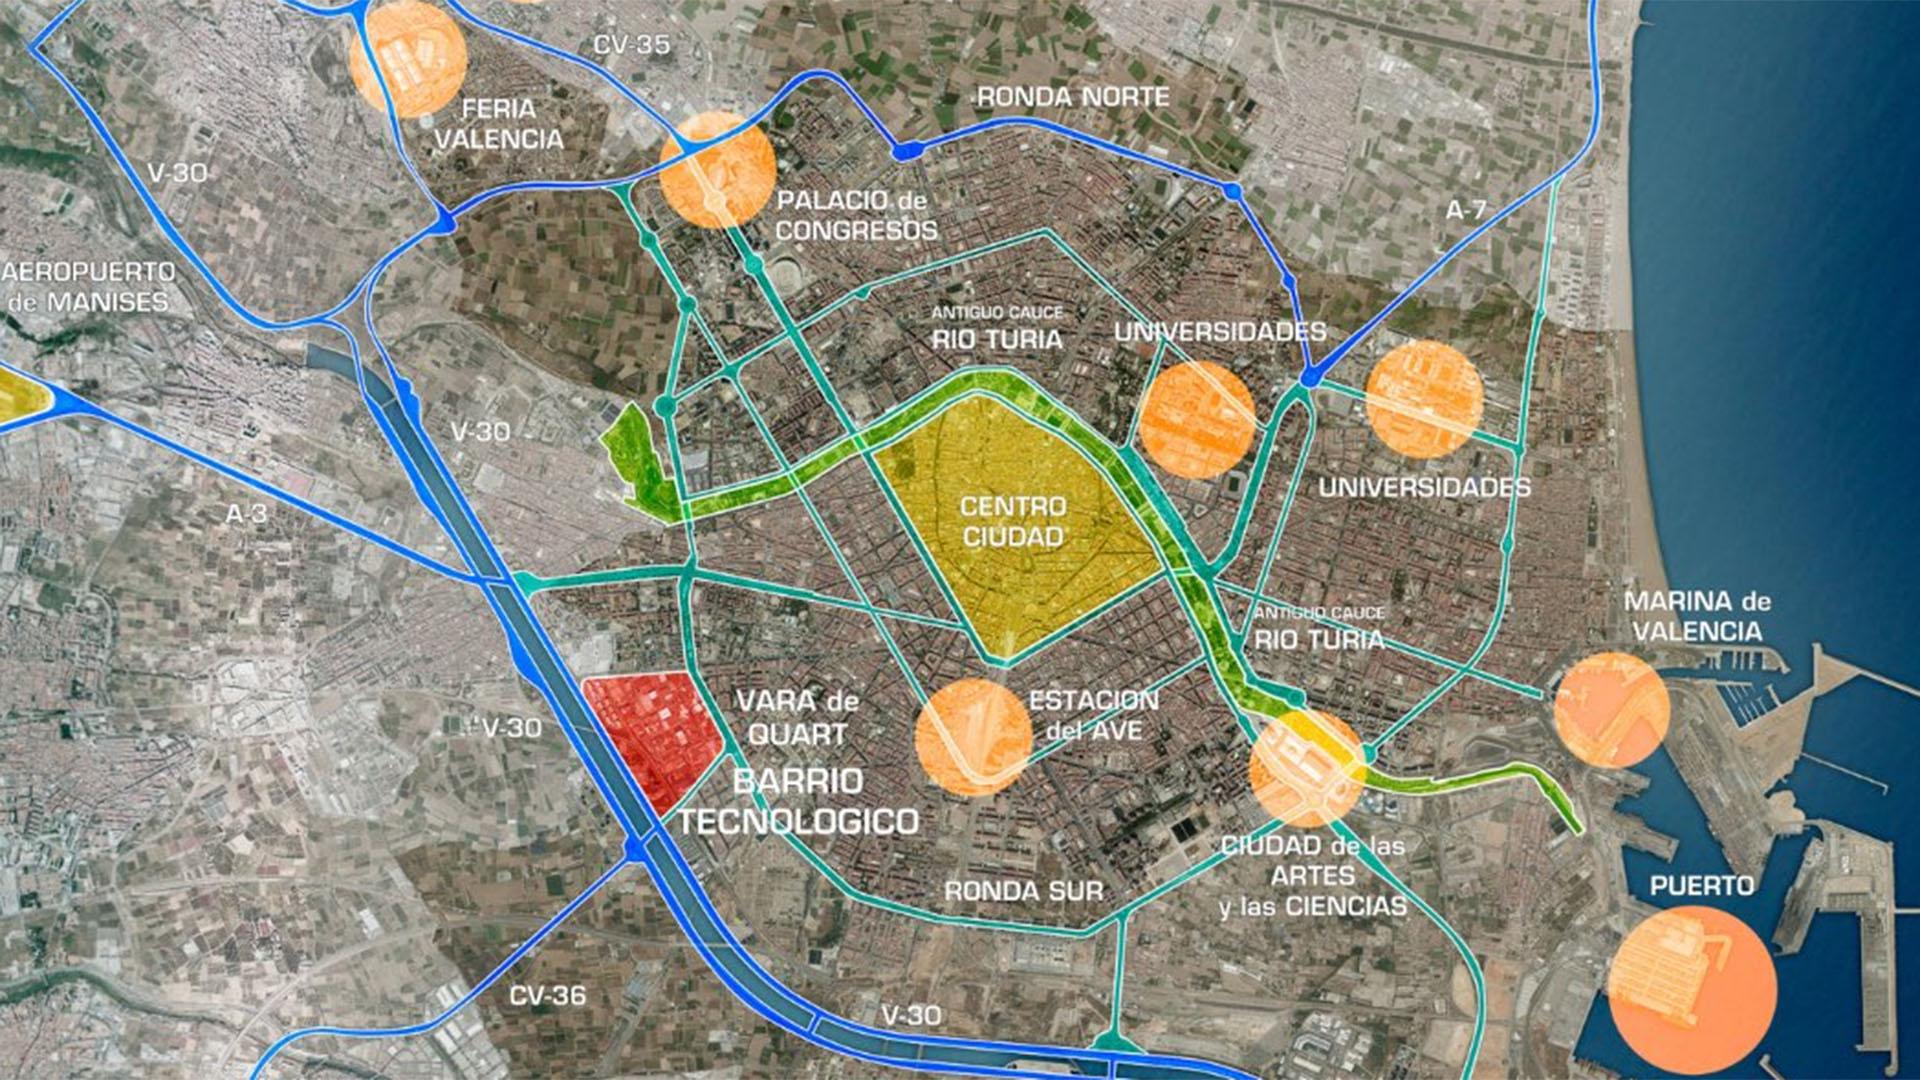 JGL. Distrito innovador Vara de Quart